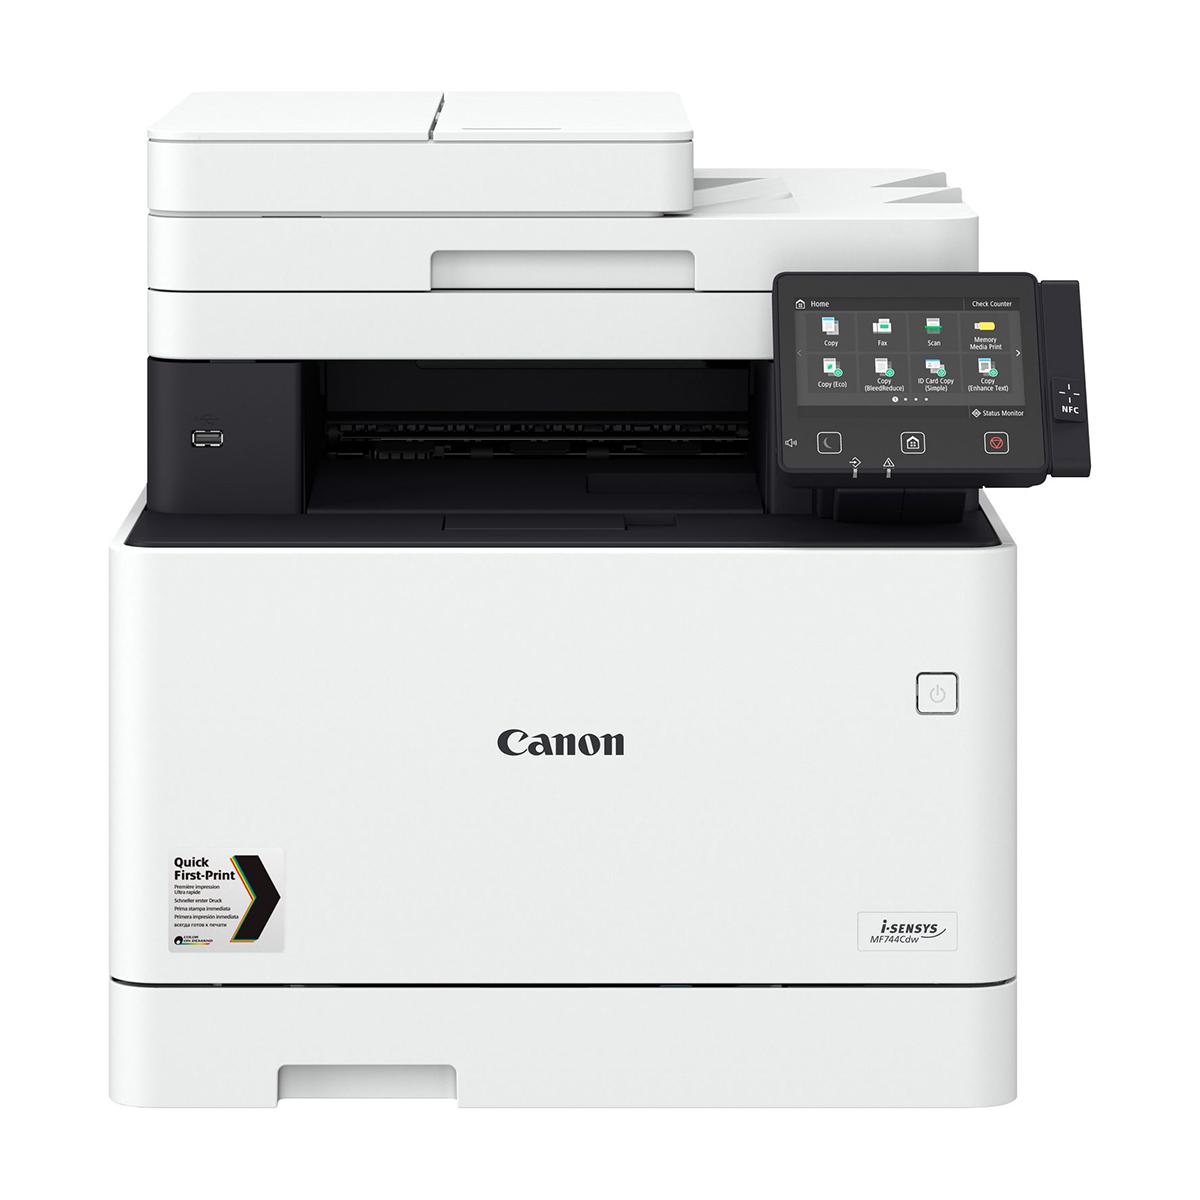 Canon i-SENSYS MF744CDW A4 Colour Laser Multifunction